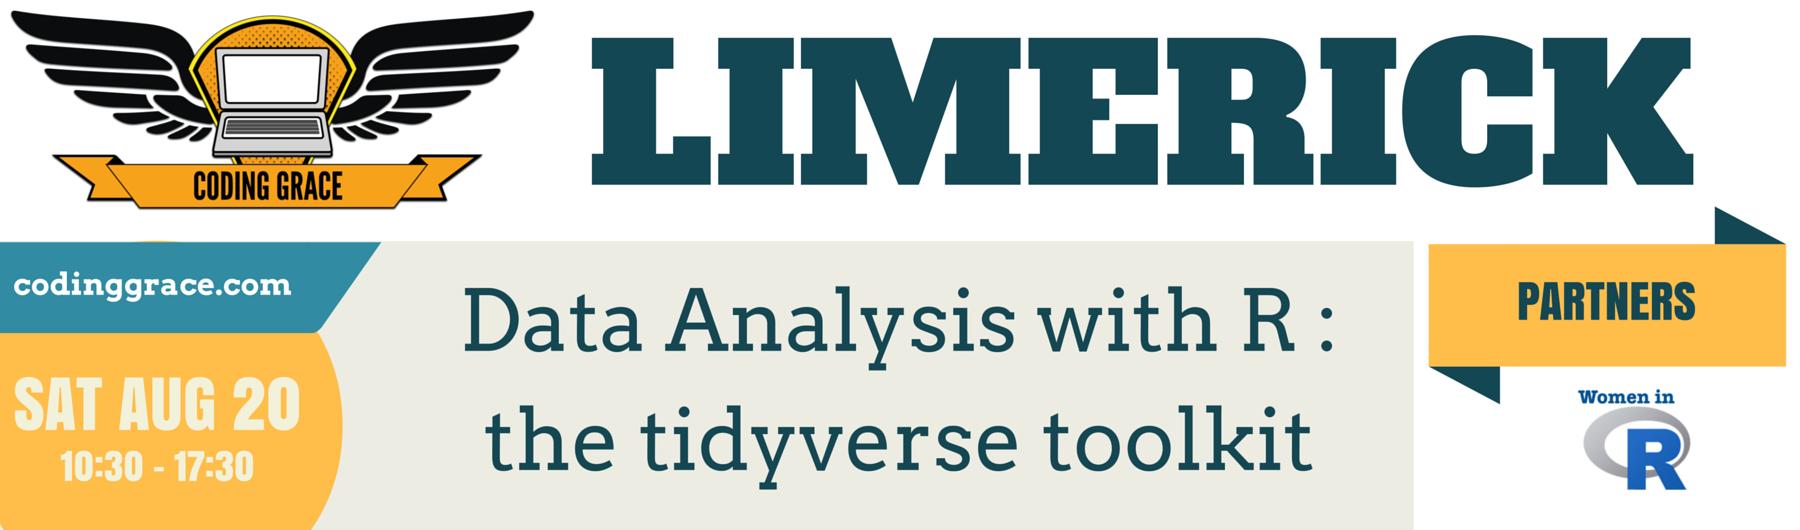 [Limerick] Data Analysis with R : the tidyverse toolkit